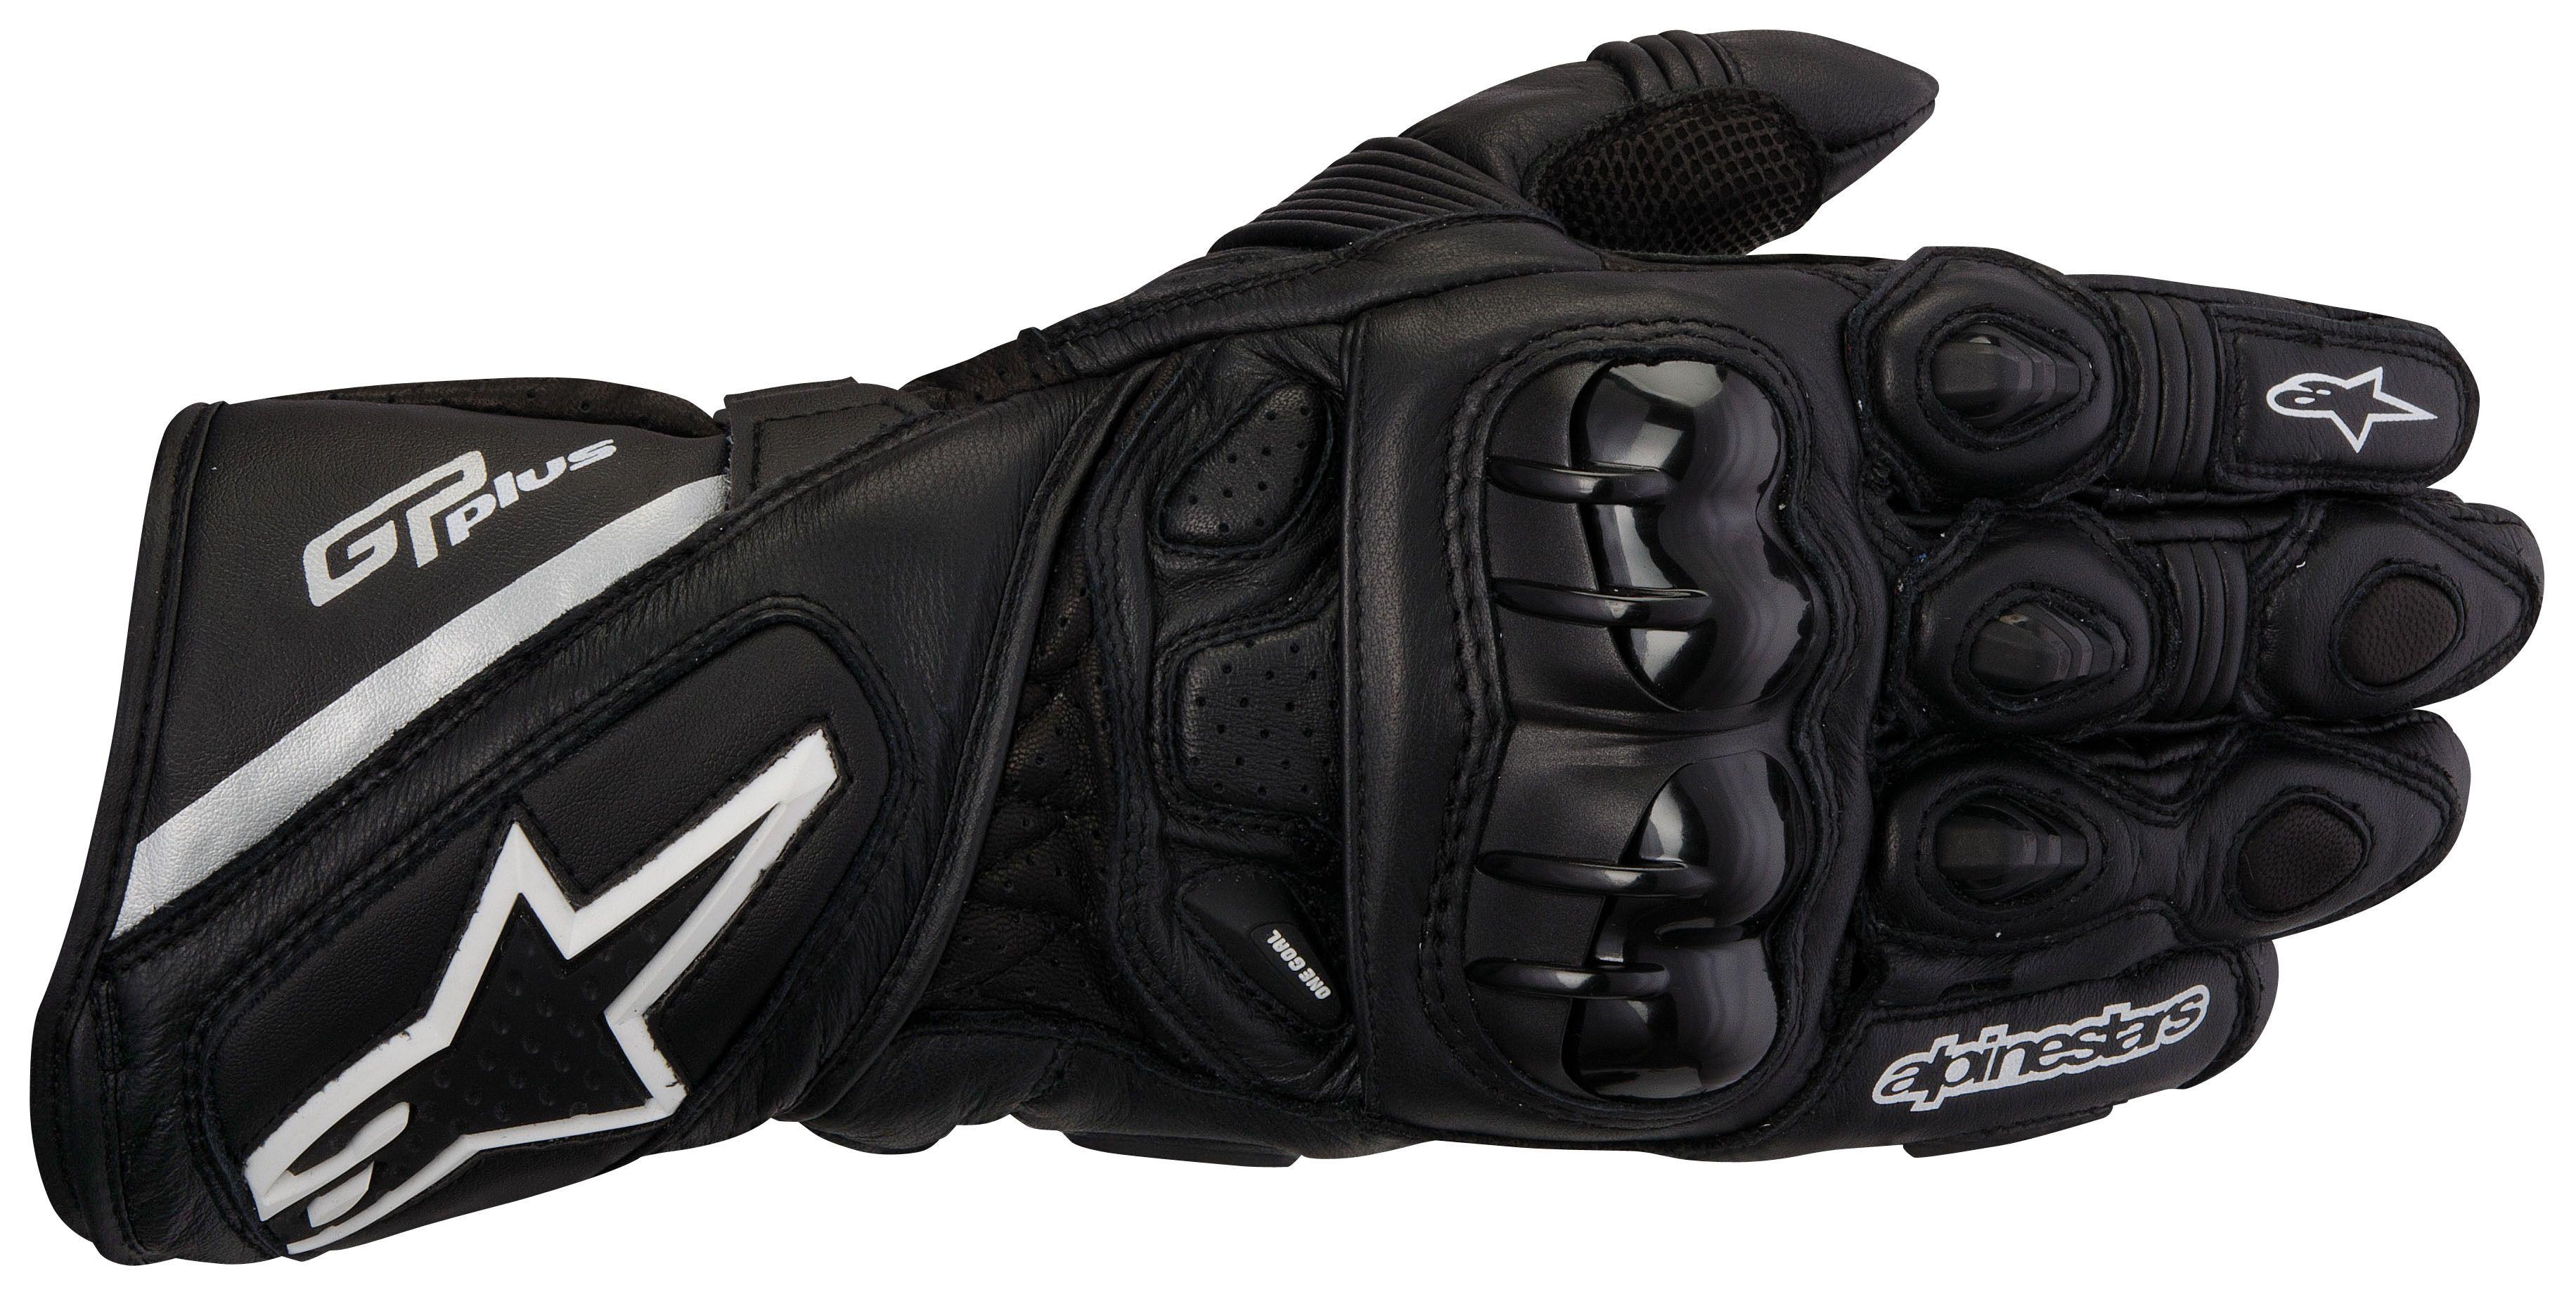 Alpine Motorcycle Gear >> Alpinestars GP Plus Gloves - RevZilla